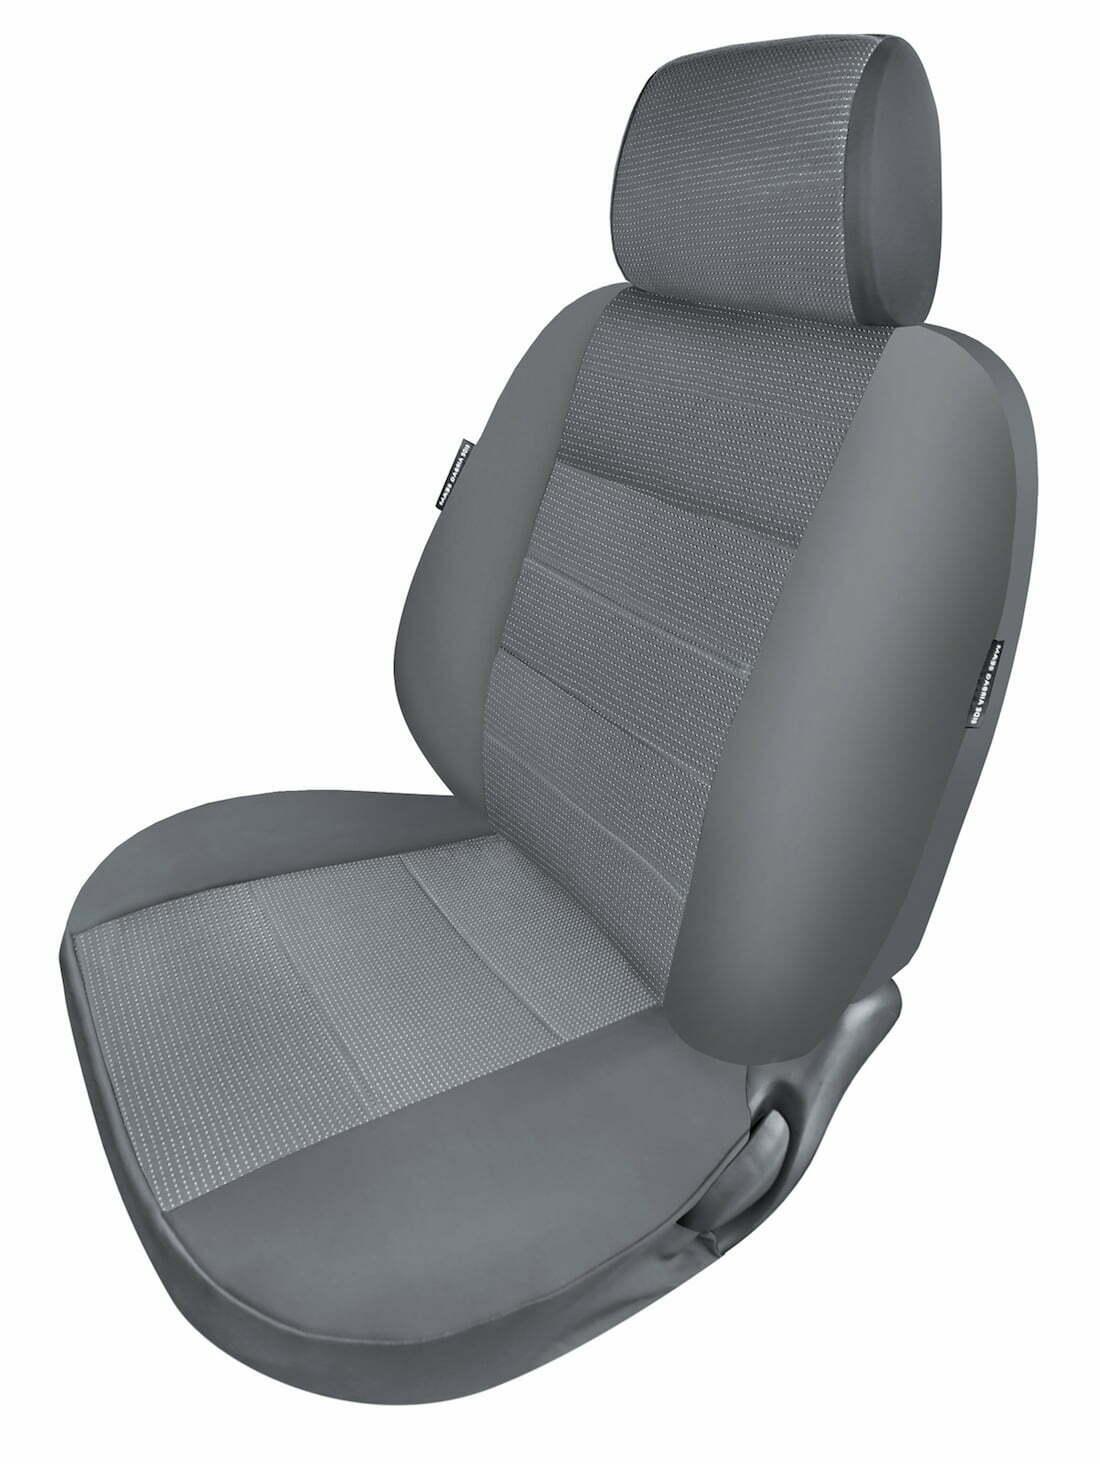 Swell Nissan Navara D40 2005 2016 St St X Dual Cab Forskolin Free Trial Chair Design Images Forskolin Free Trialorg